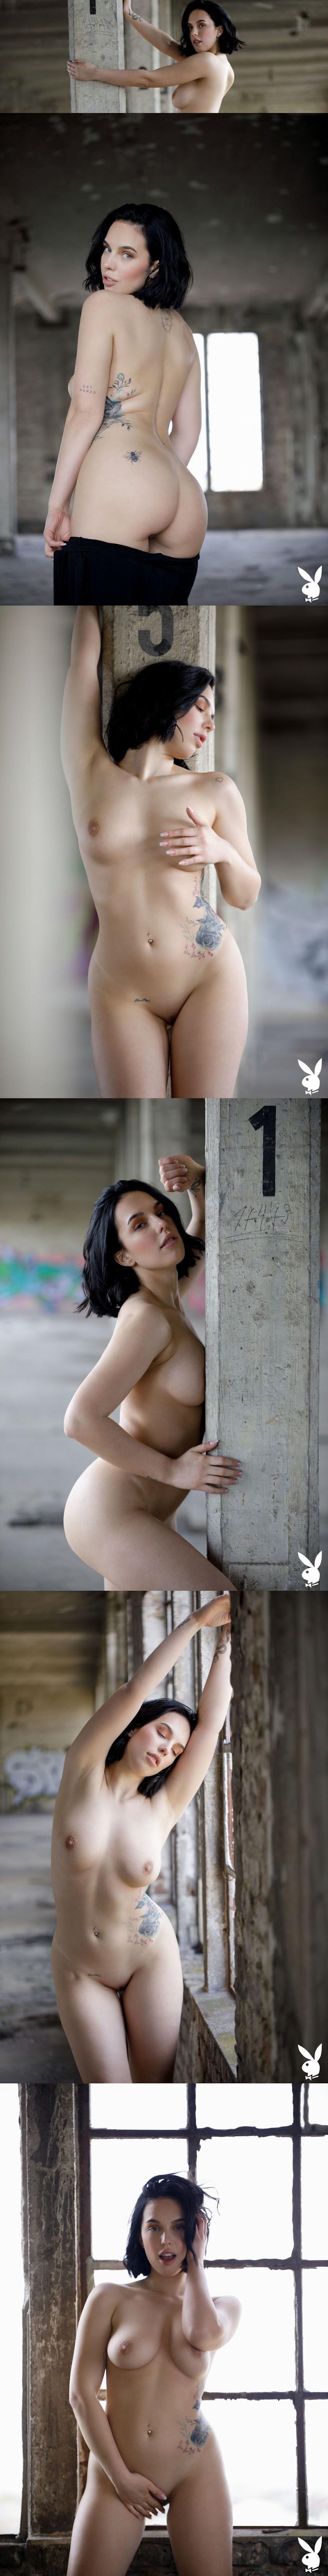 [Playboy Plus] Marisa Ehret in Room to Move sexy girls image jav